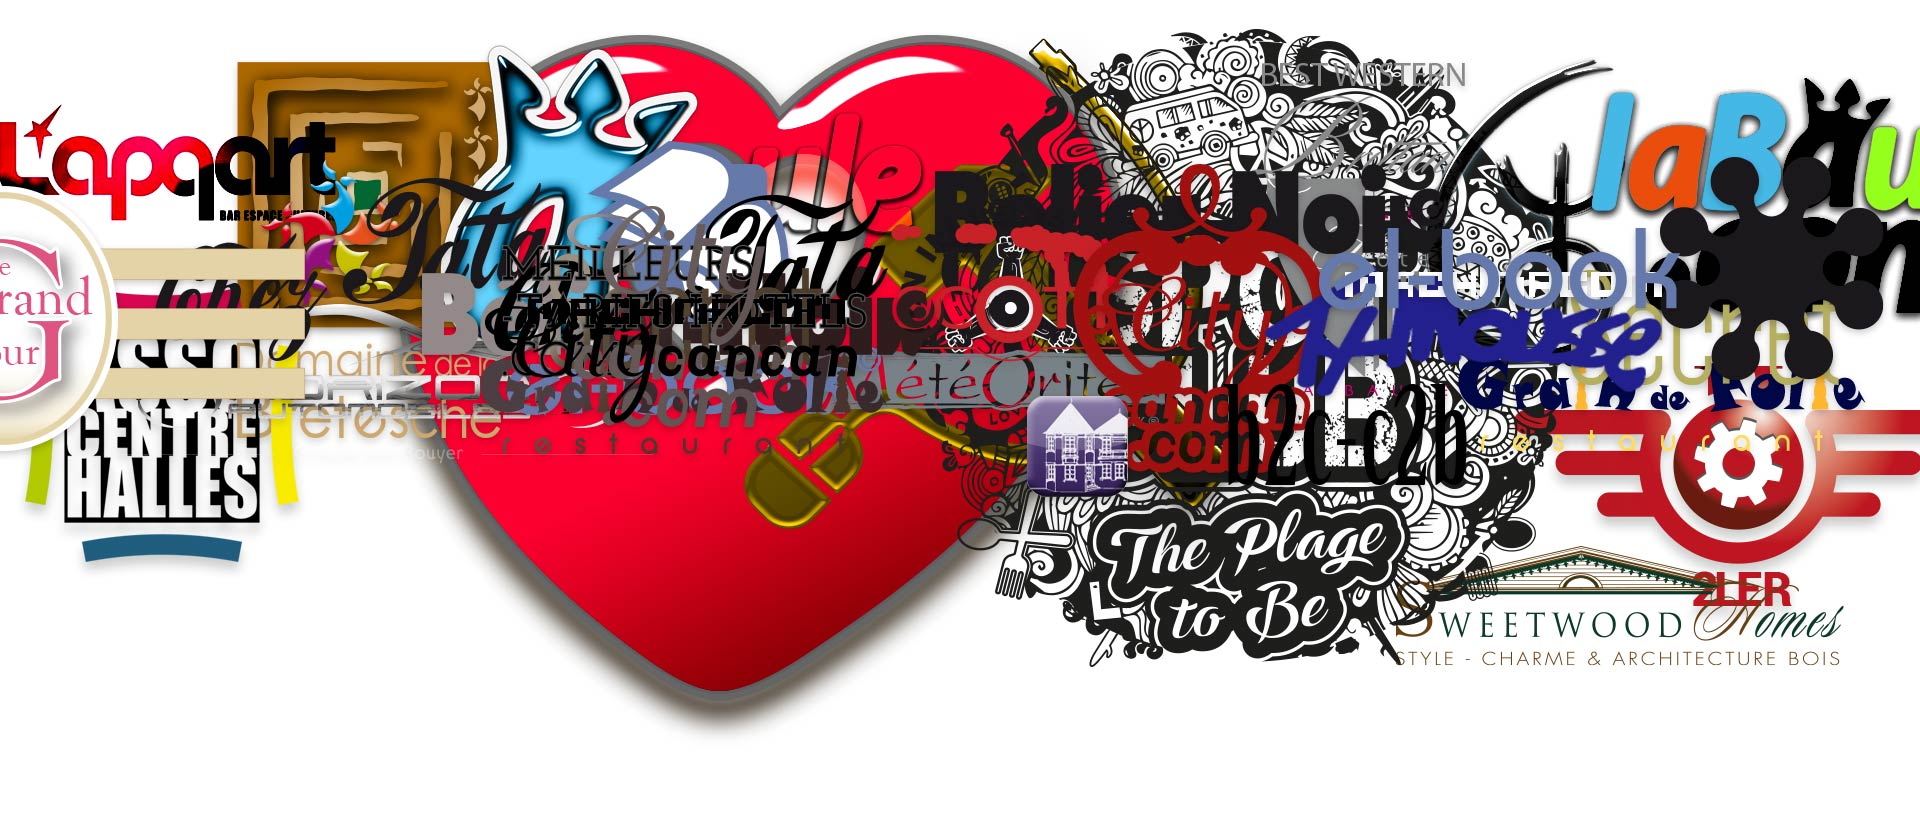 Logos et Charte graphique Digital by Paradiseisnotlost